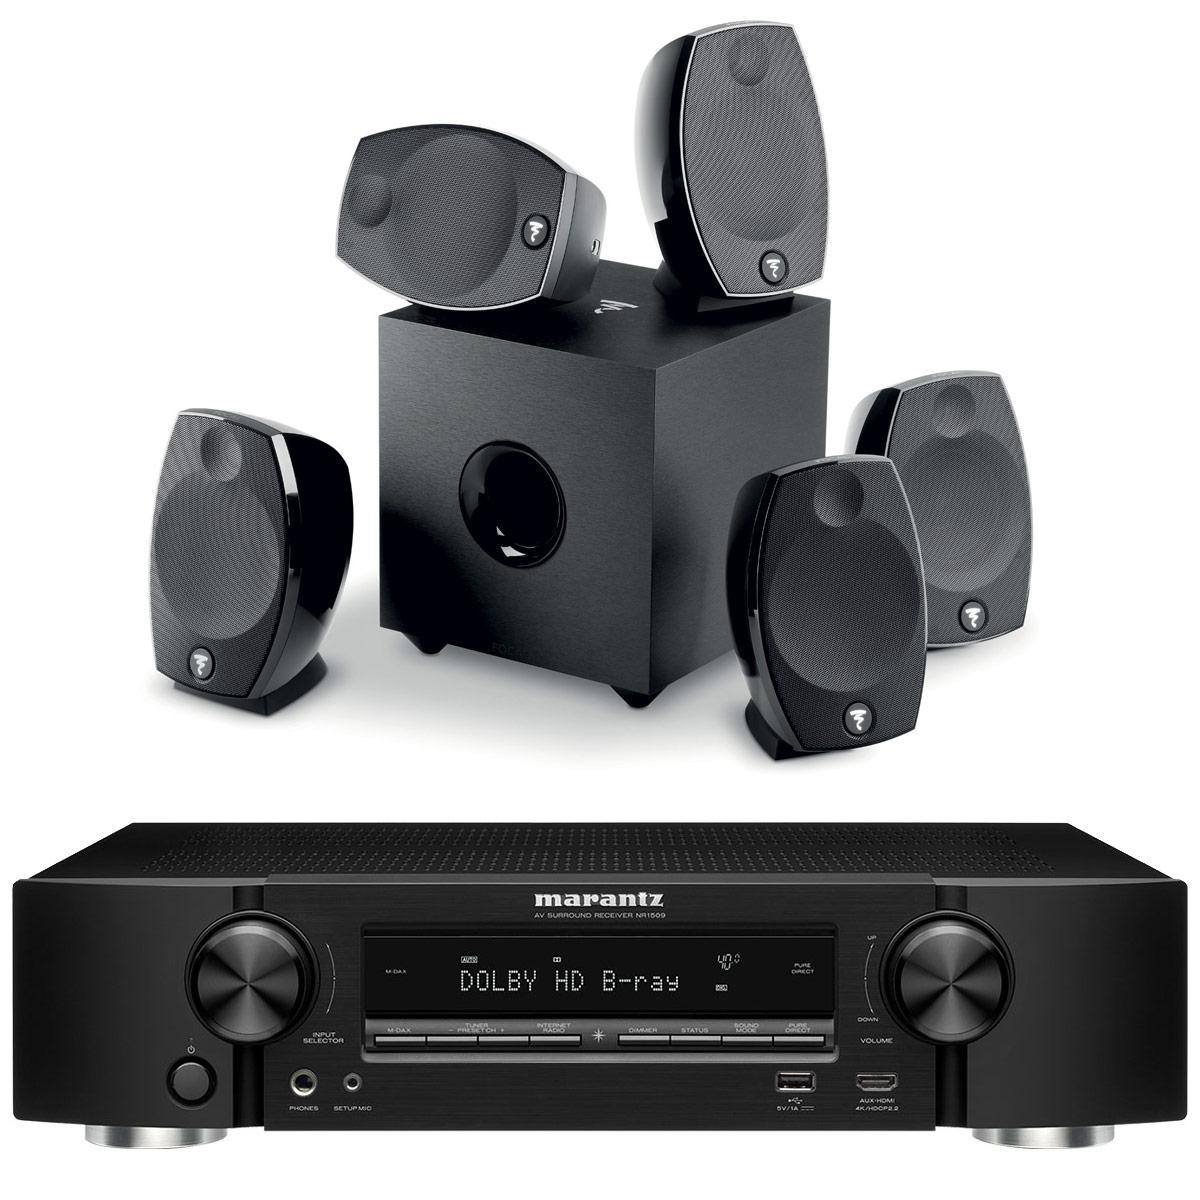 Ensemble home cinéma Marantz NR1509 Noir + Focal Sib Evo 5.1 Ampli-tuner Home Cinema Slim 3D Ready 5.2 - Dolby TrueHD / DTS-HD Master Audio - 6x HDMI 4K UHD, HDCP 2.2, HDR - Multiroom - Wi-Fi/Bluetooth/AirPlay 2 - Amazon Alexa + Pack d'enceintes 5.1